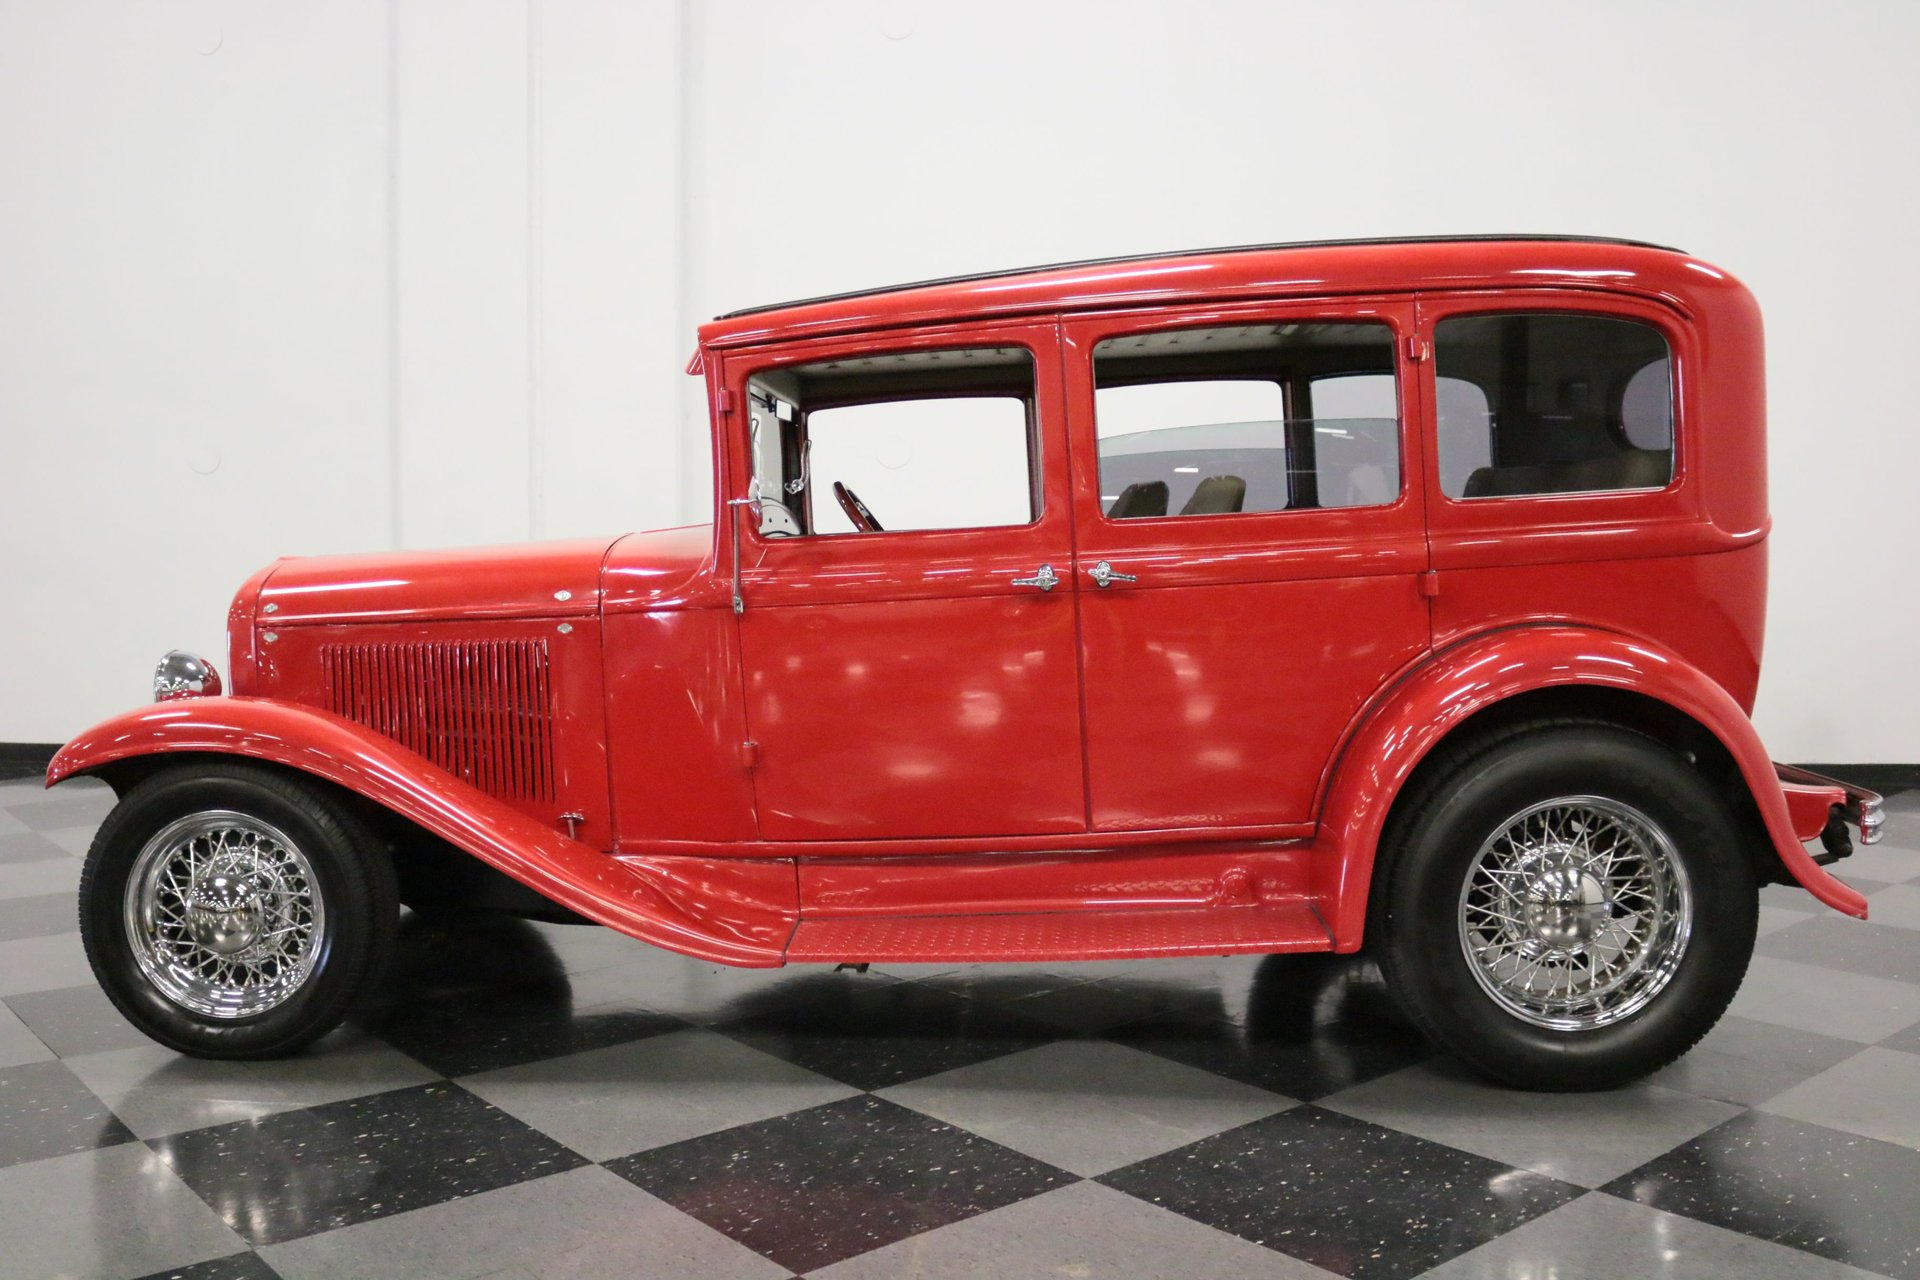 1932 Plymouth 4 Door Sedan | Streetside Classics - The ...